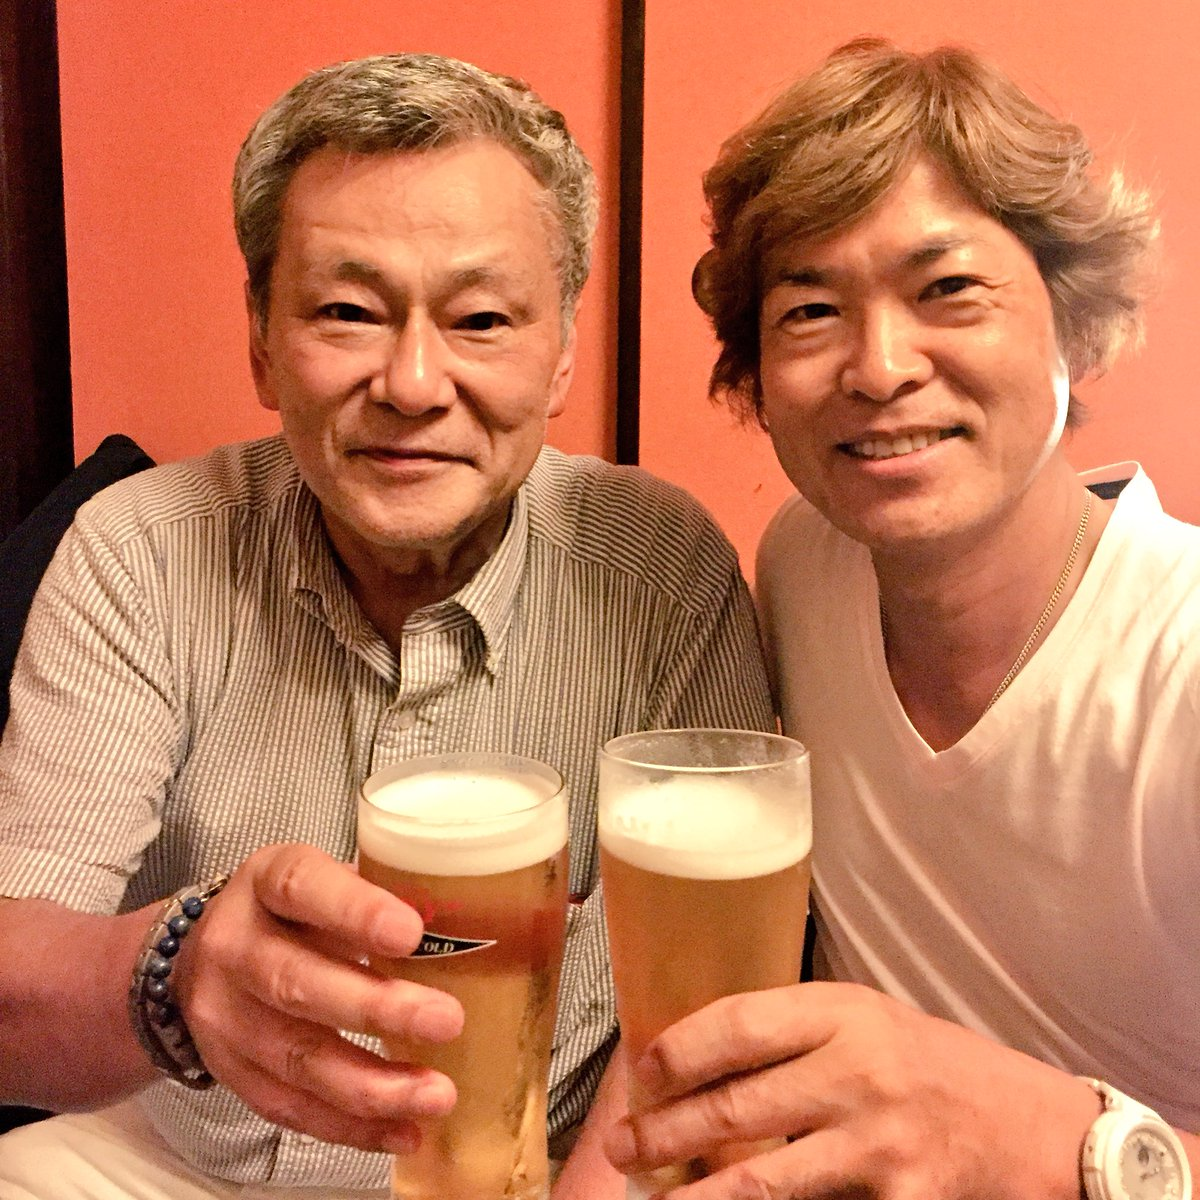 古谷 徹 Toru Furuya on Twitter...